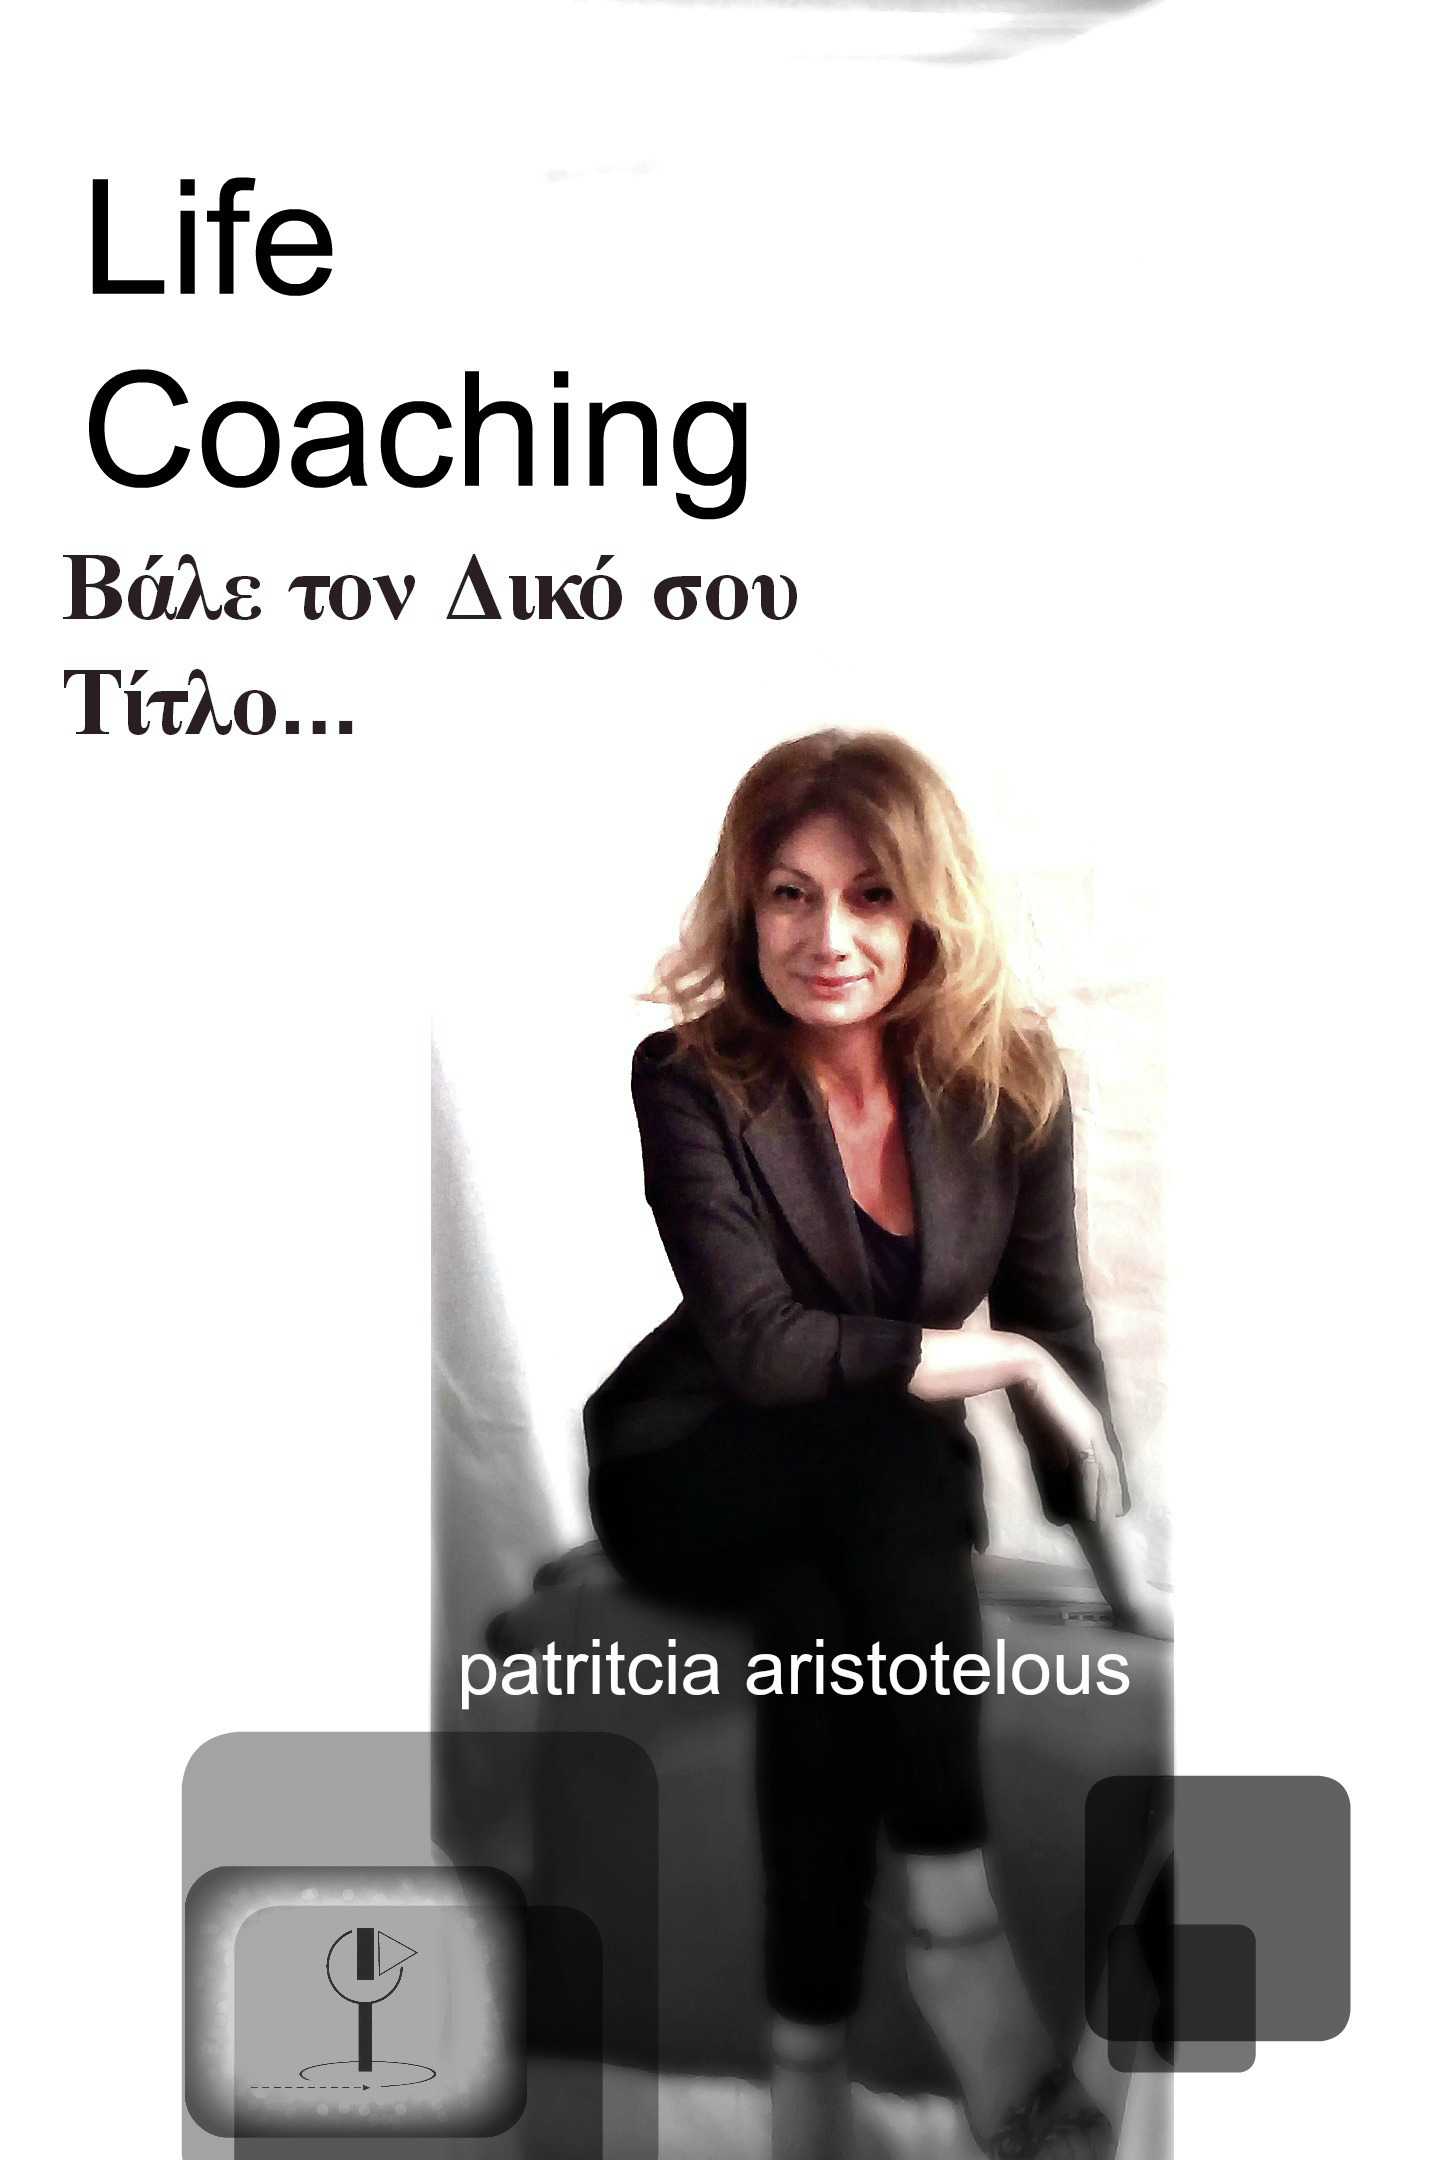 Life Coaching - Βάλε τον Δικό σου Τίτλο....